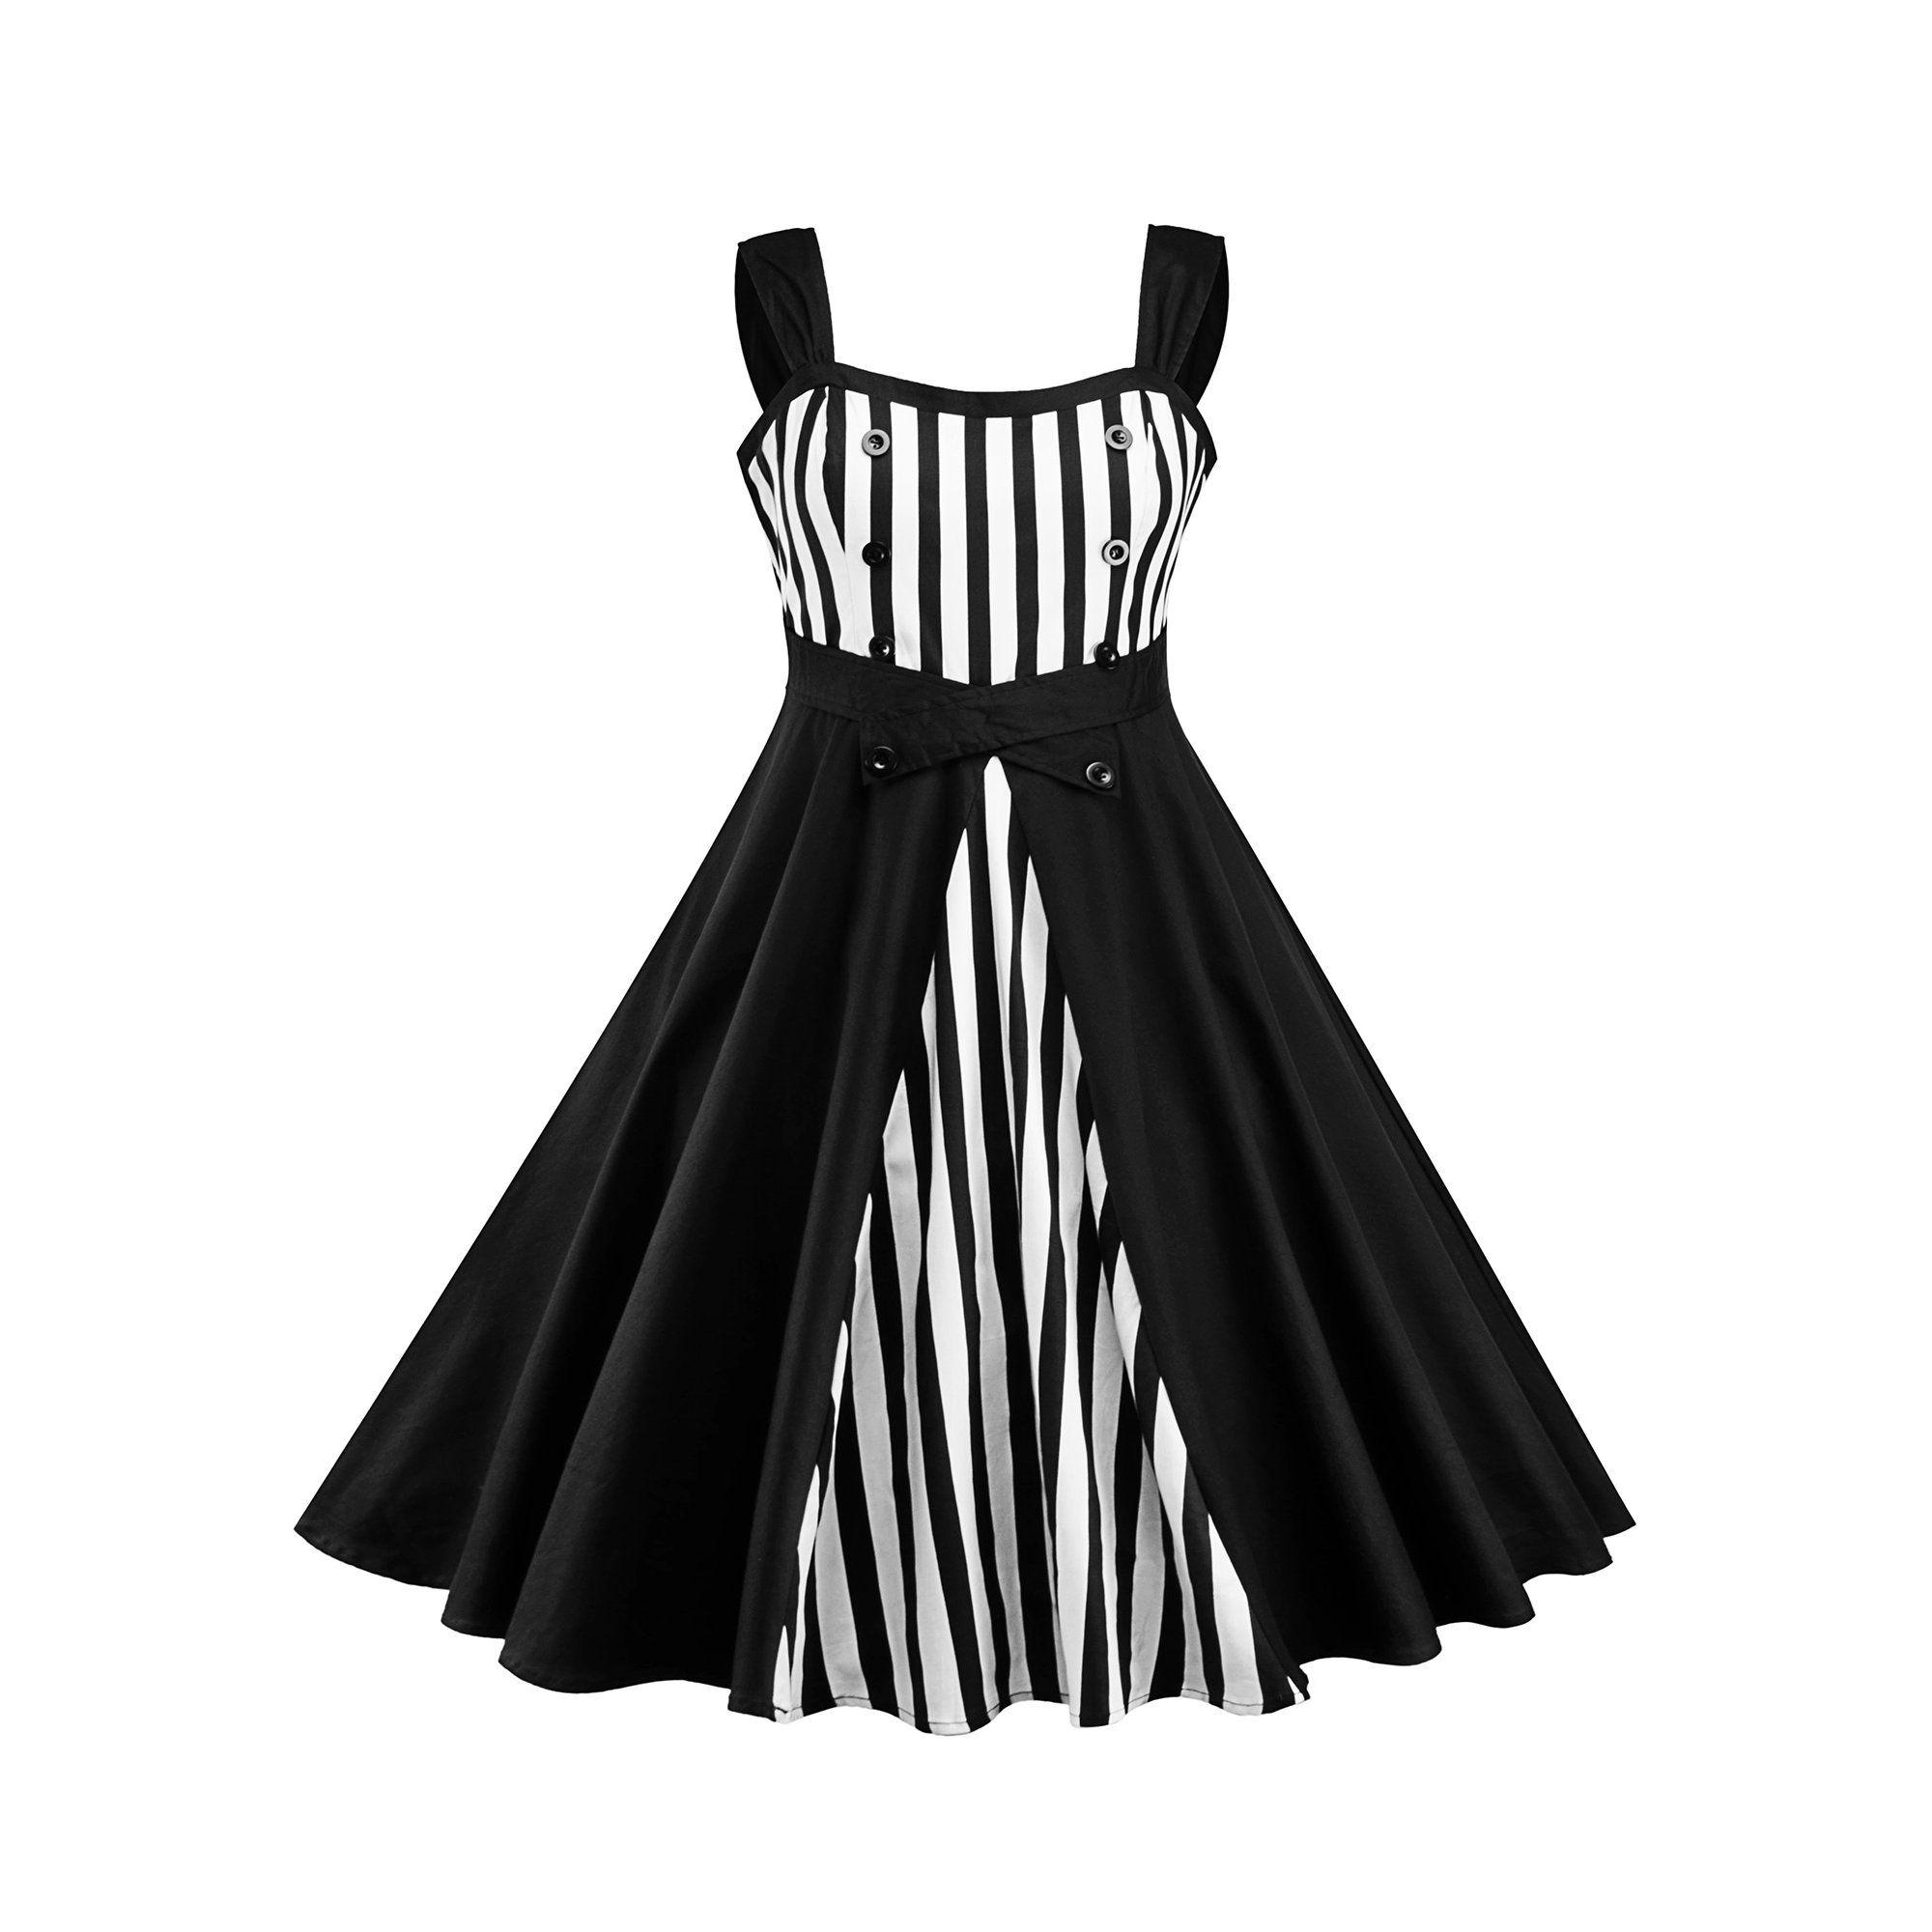 Himone Plus Size 50 S 60 S Rockabilly Dress Vintage Striped Black Swing Pinup Housewife Party Dress Walmart Vintage Dresses Rockabilly Dress Insert Dresses [ 2000 x 2000 Pixel ]